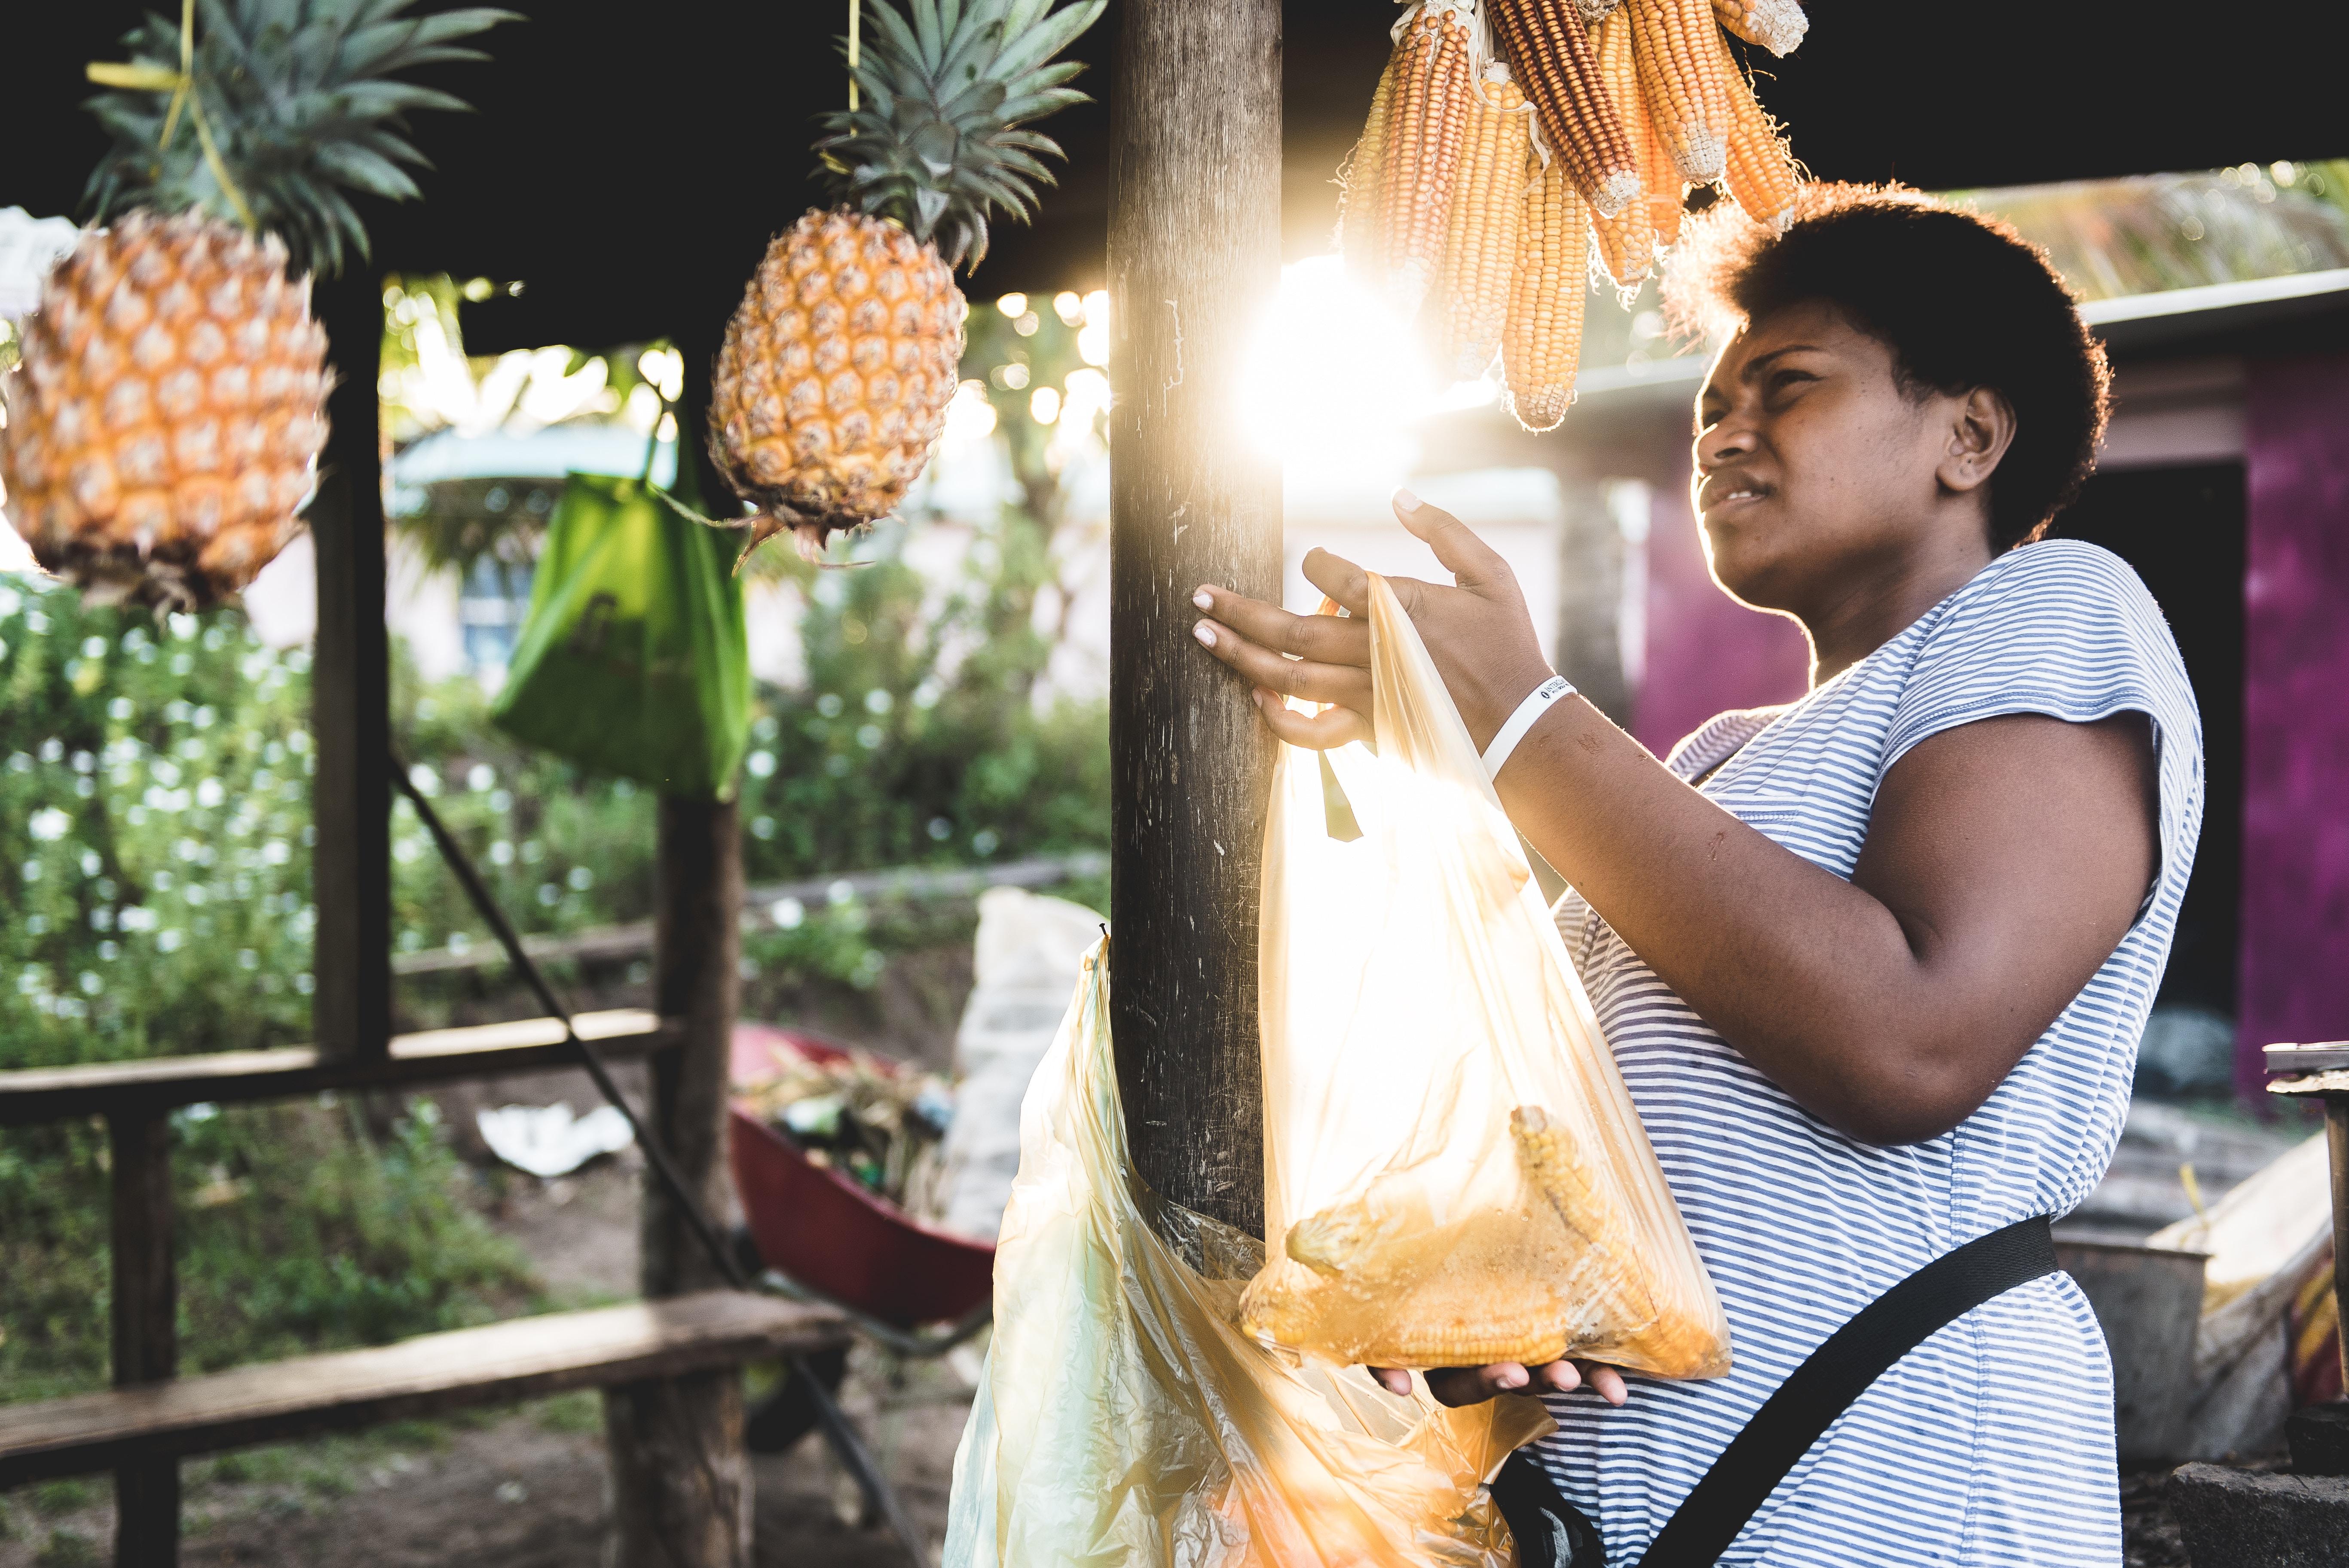 woman holding yellow plastic bag near pineapple fruits